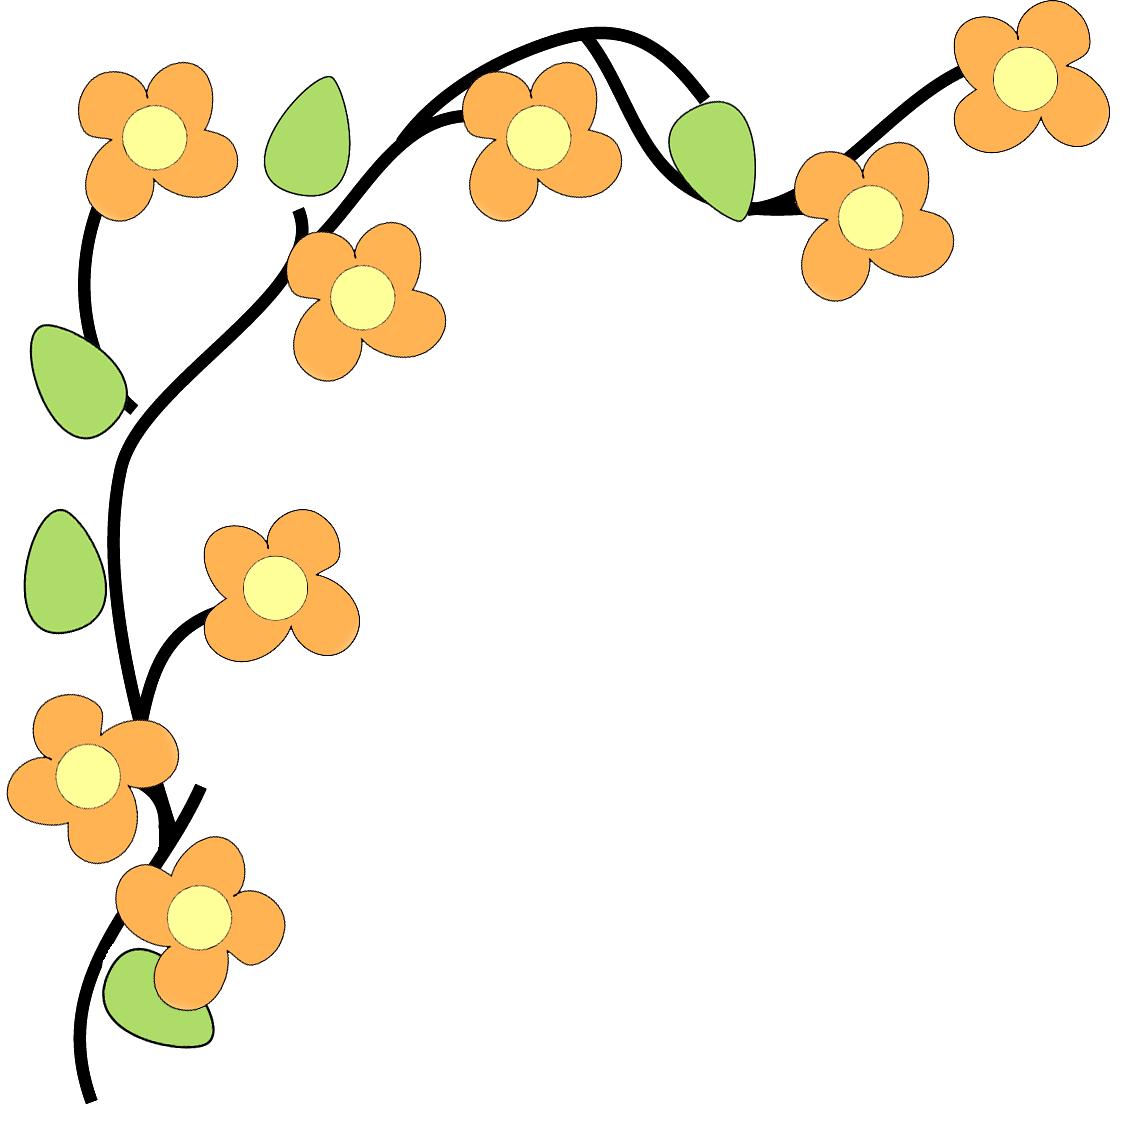 Flower Border Images  Pixabay  Download Free Pictures